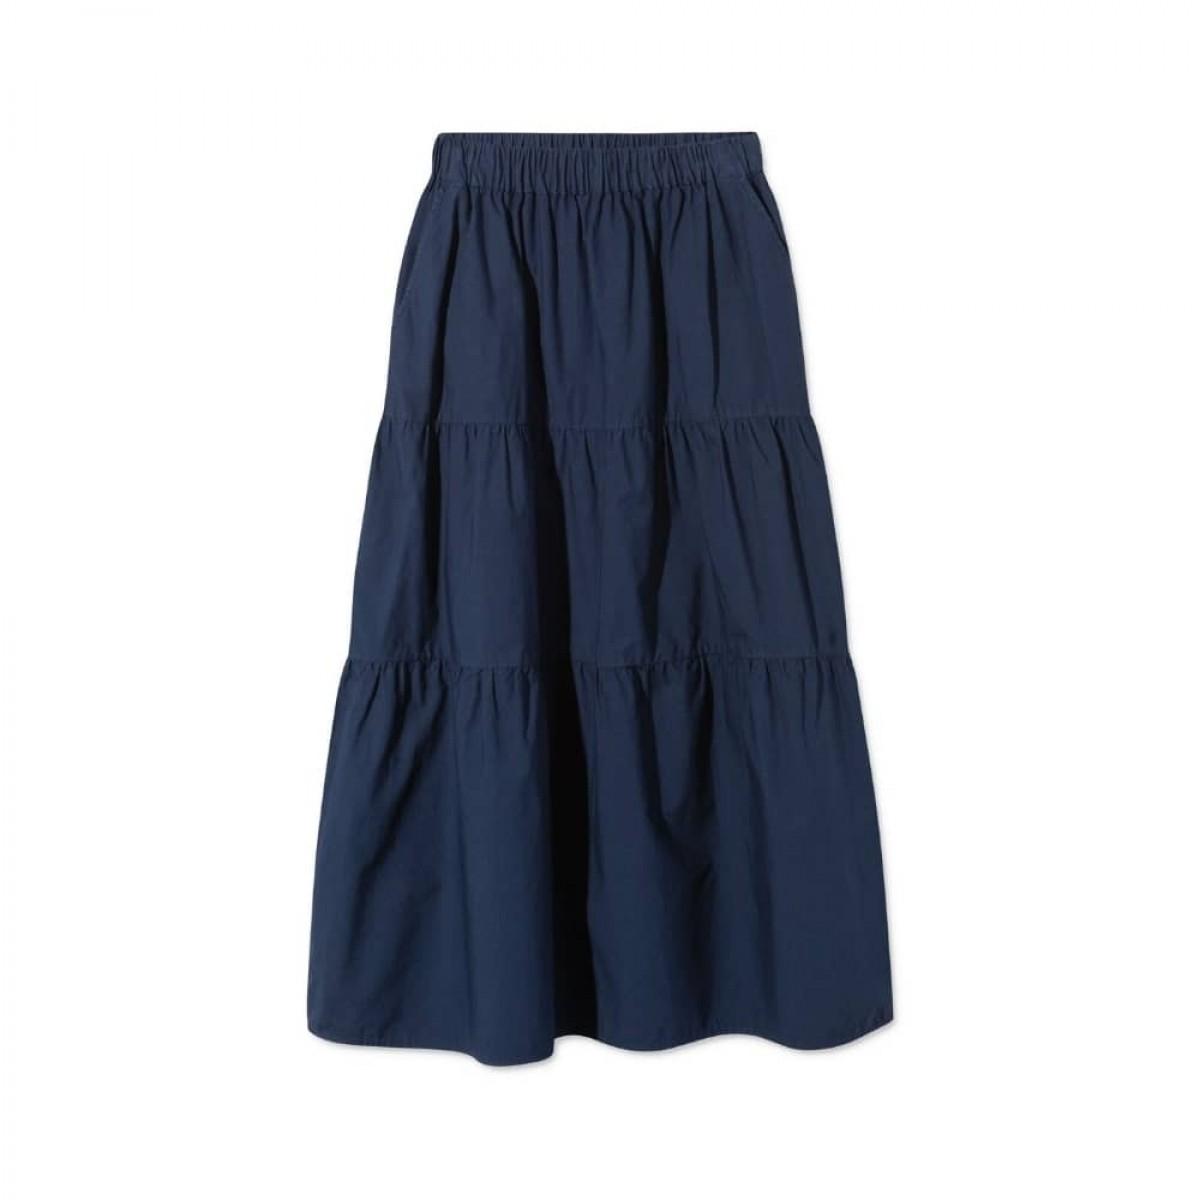 paprika nederdel - dark navy - front